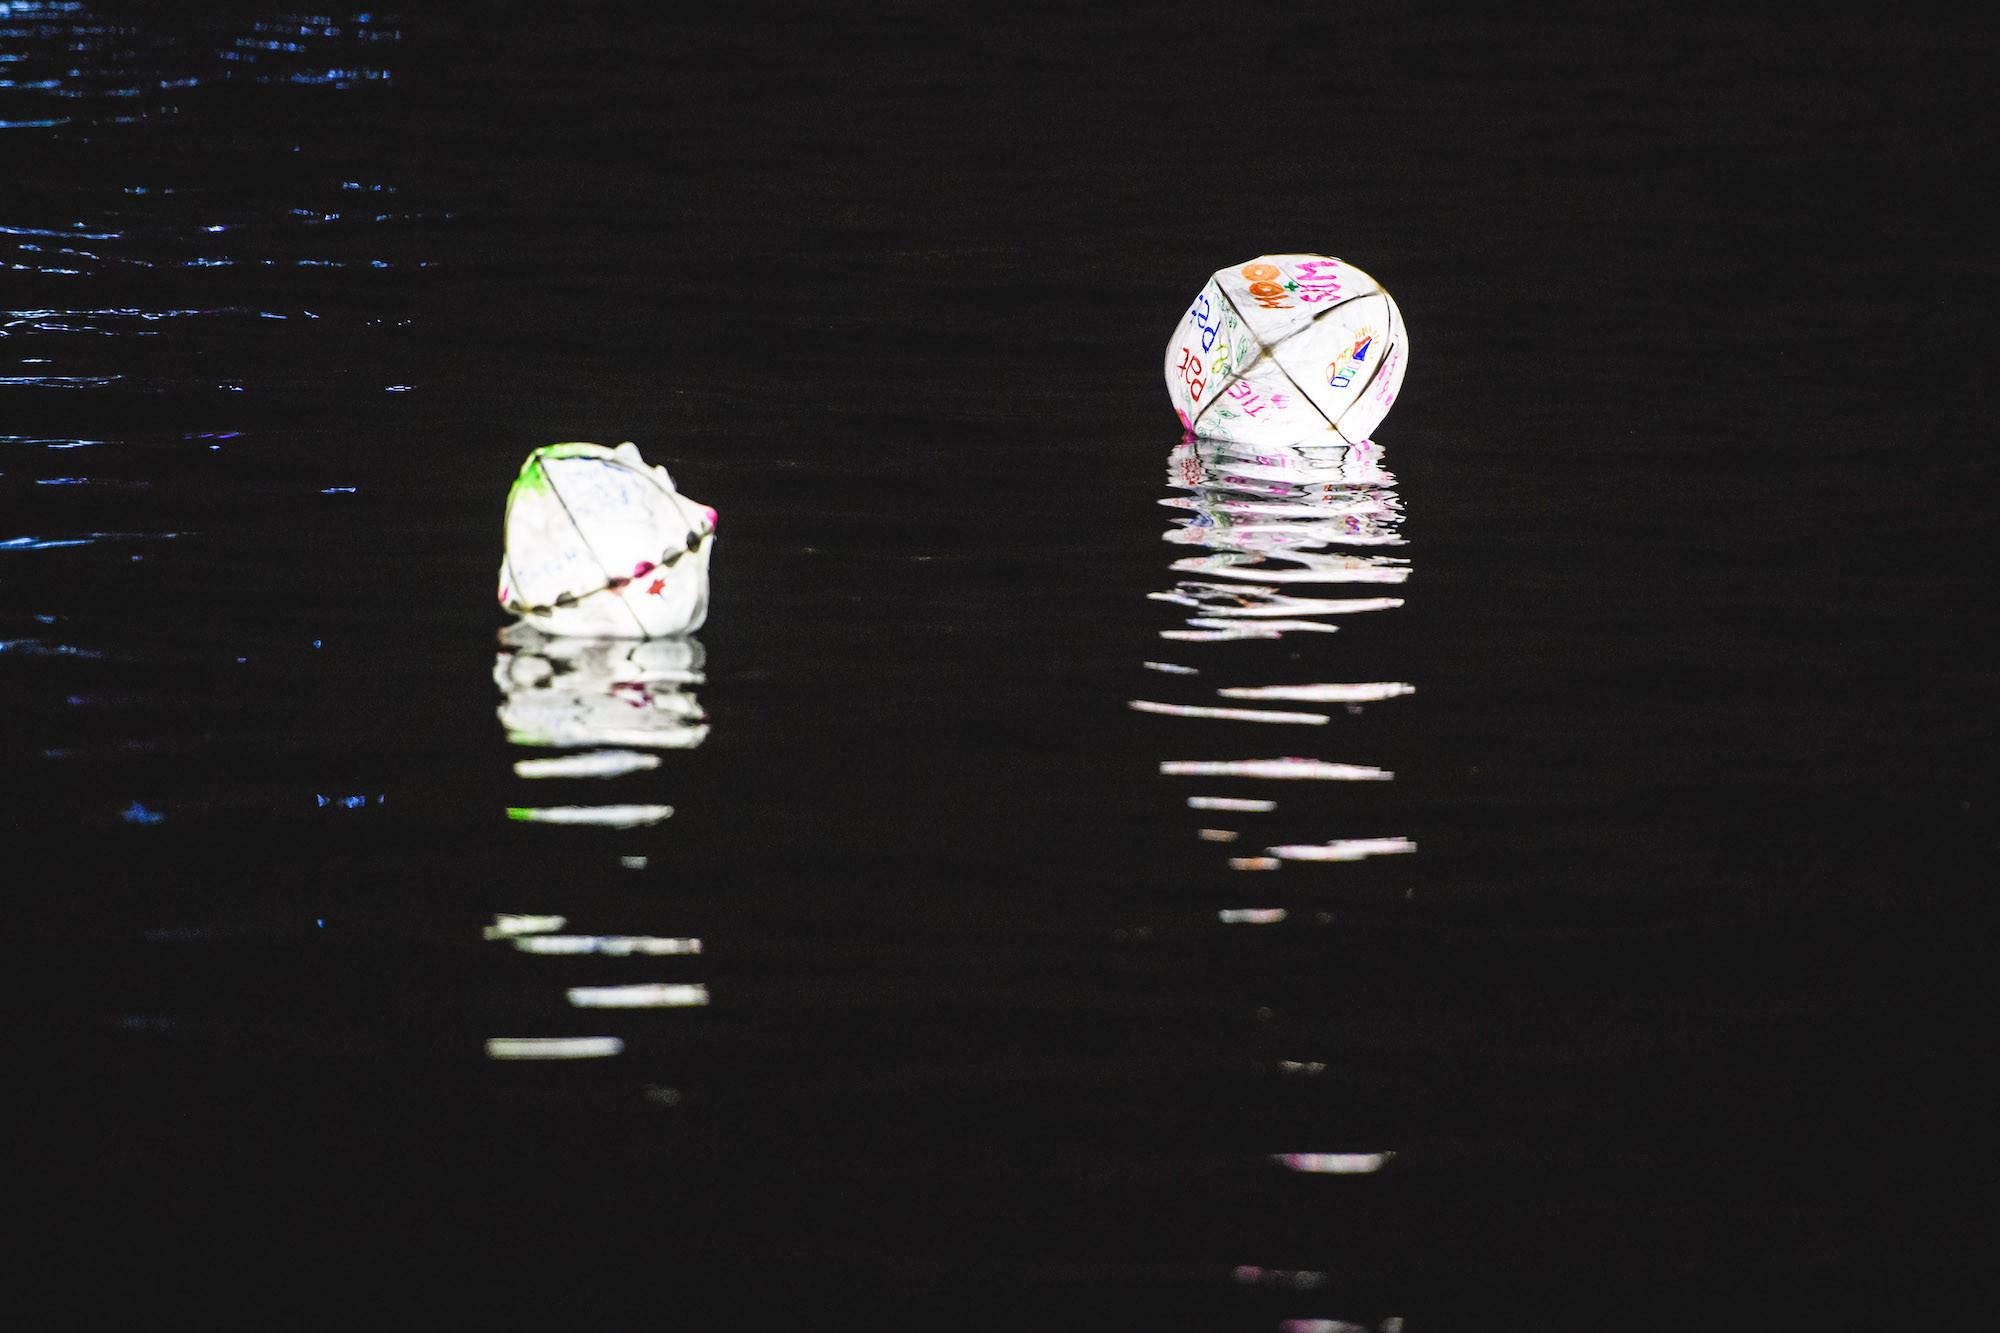 Lanterns floating on water after dark